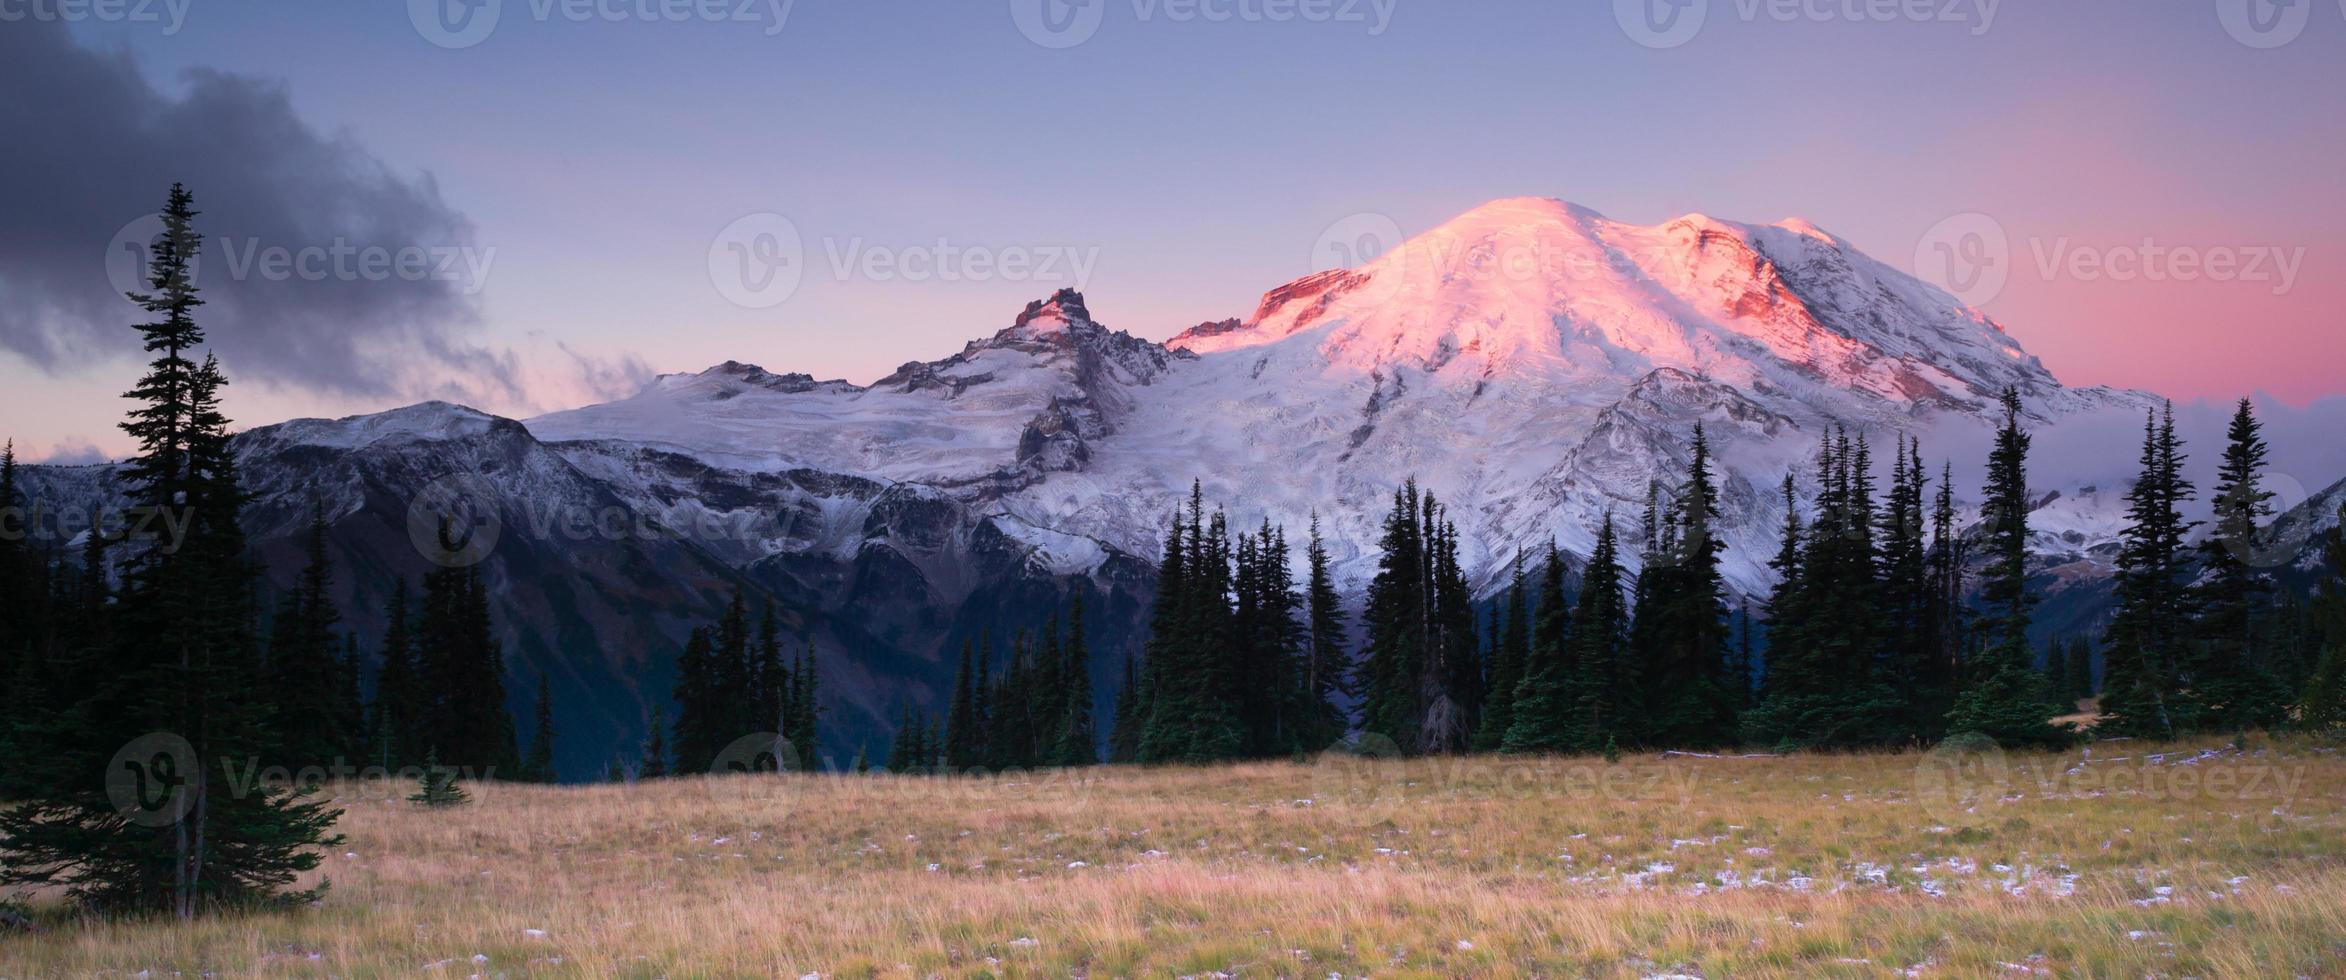 smokey zonsopgang mt regenachtiger nationaal park cascade vulkanische boog foto